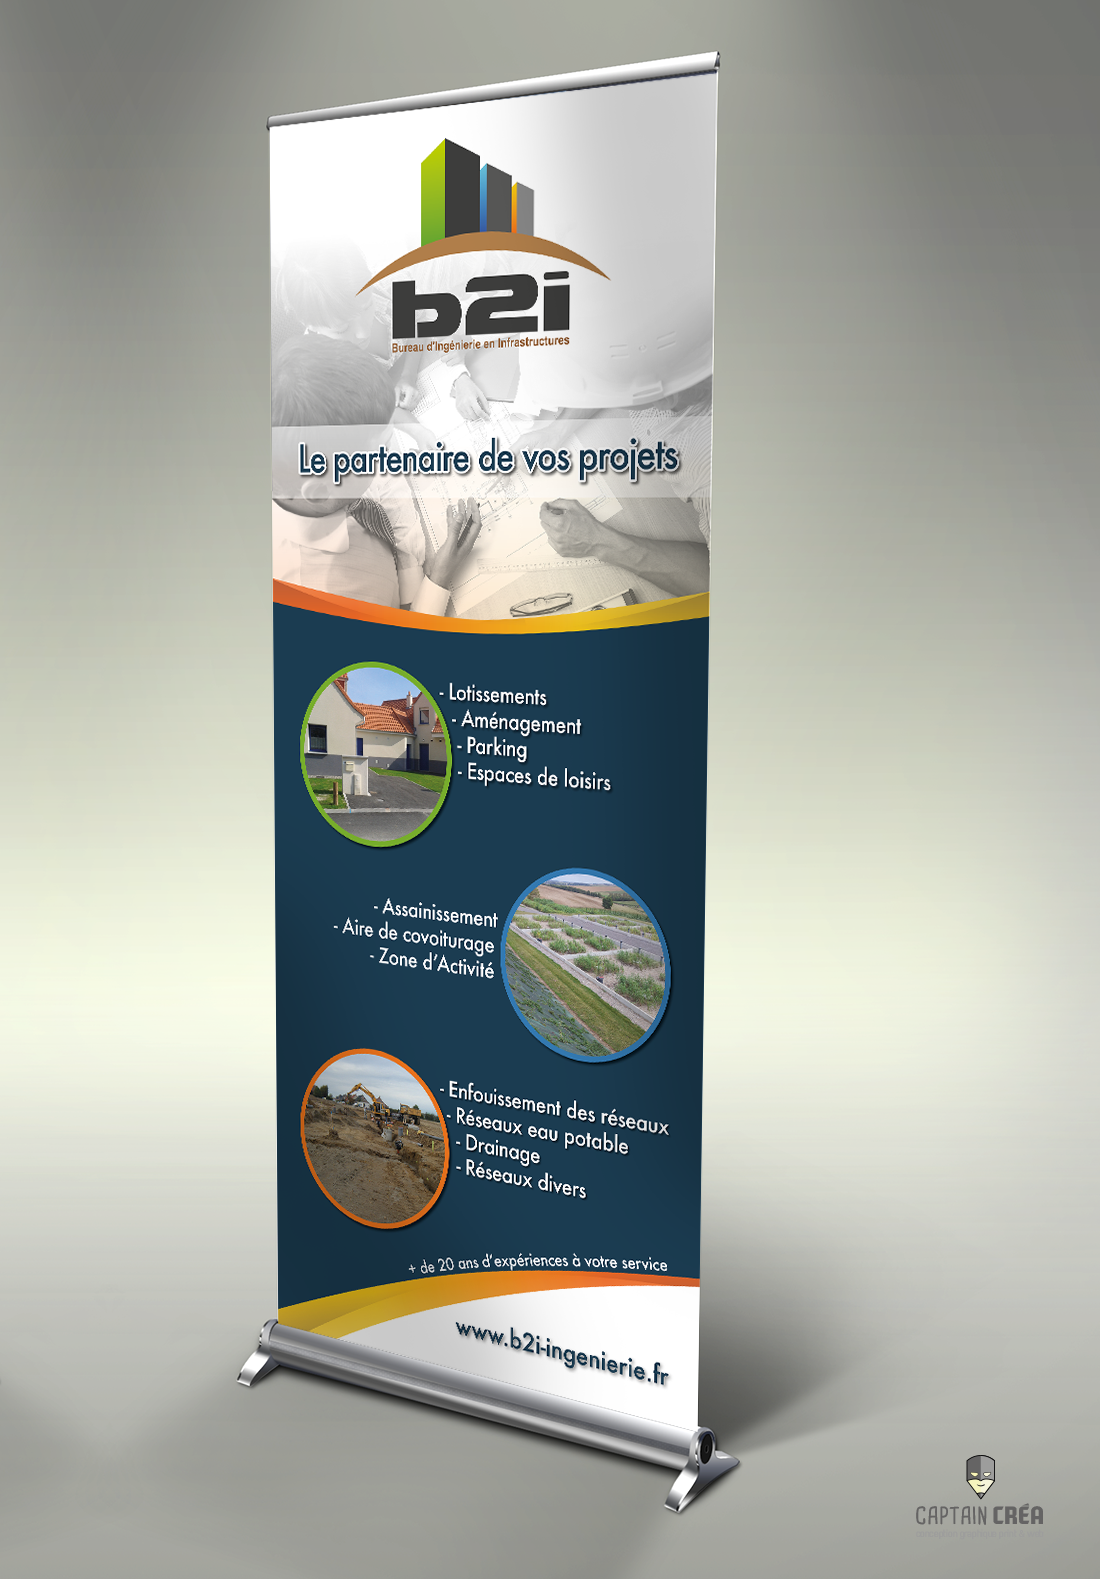 Présentation rollup B2i. site cc